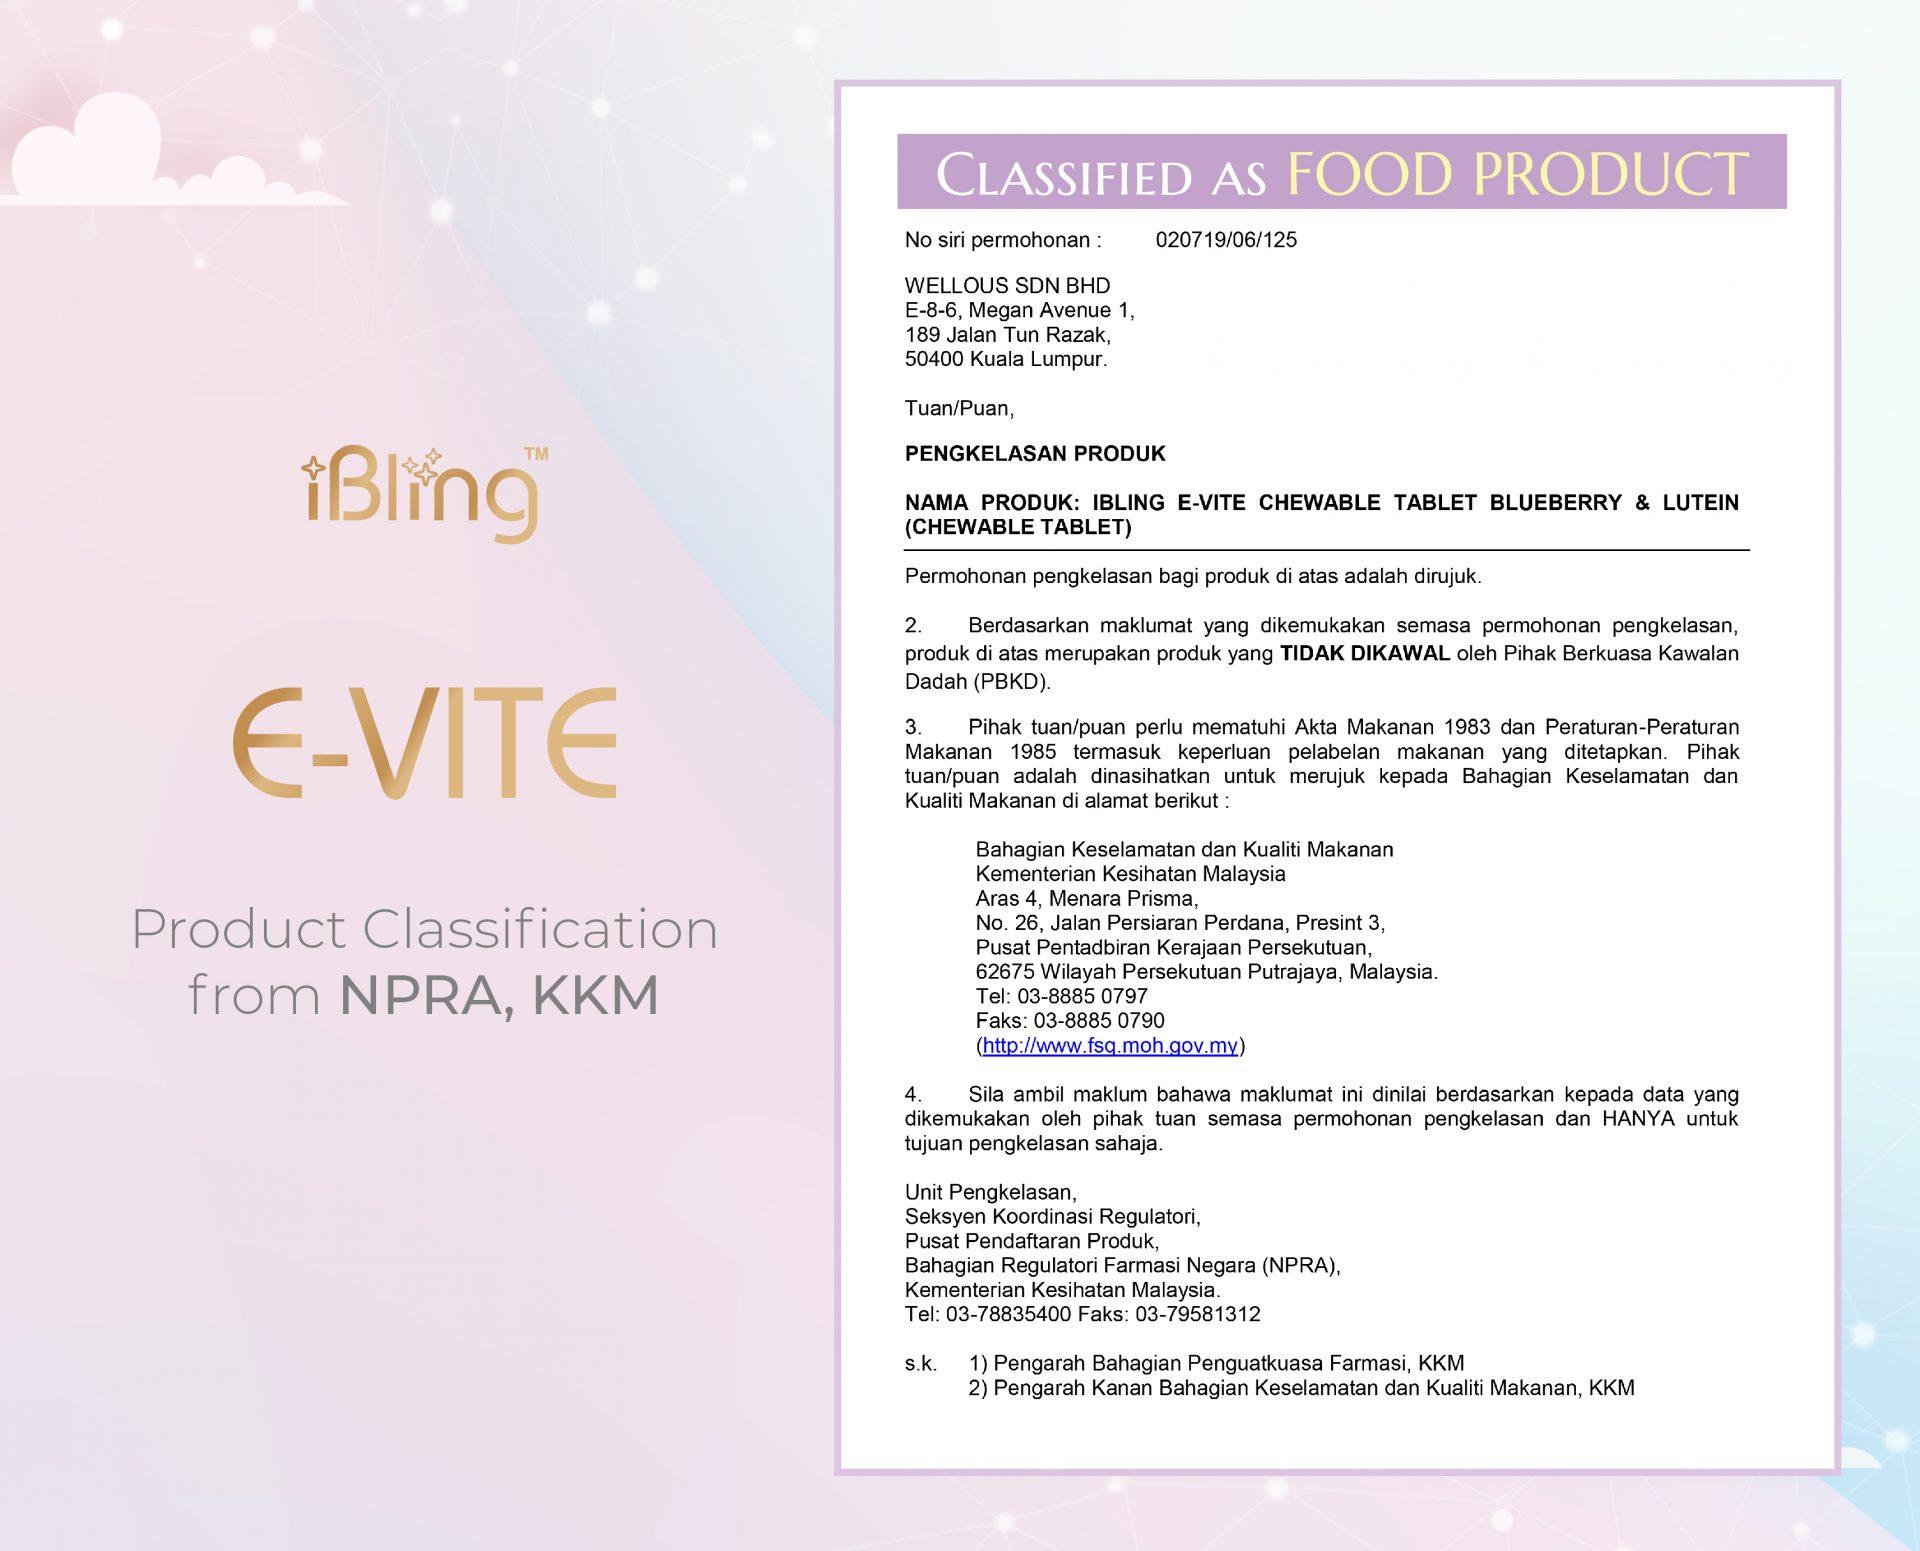 E-VITE_certificate_Food Classification_ENG